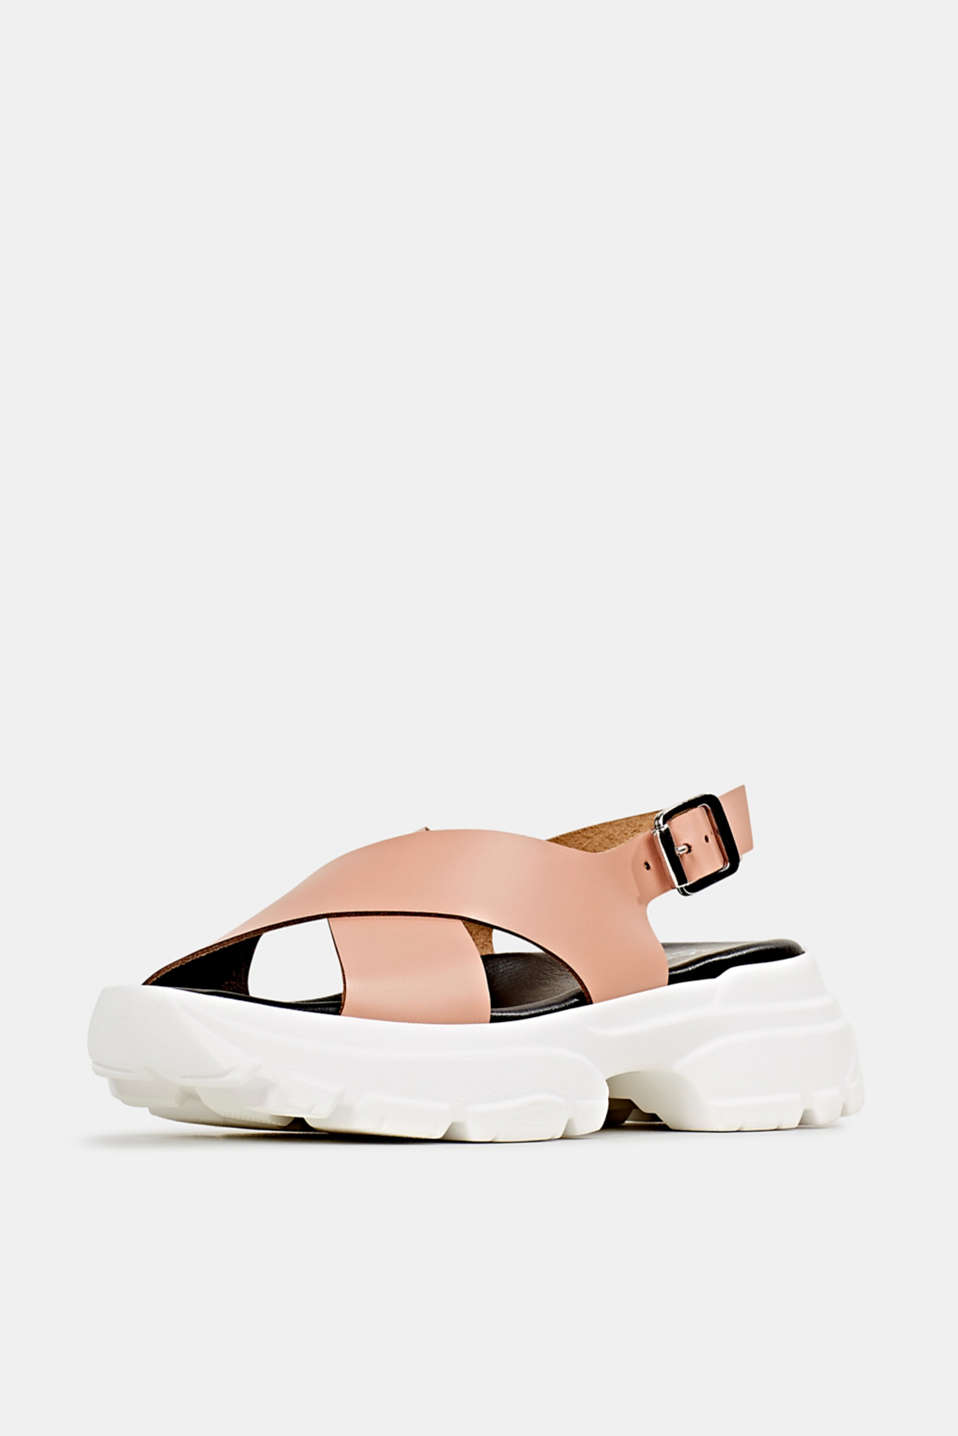 Leather trainer sandals, BLUSH, detail image number 2